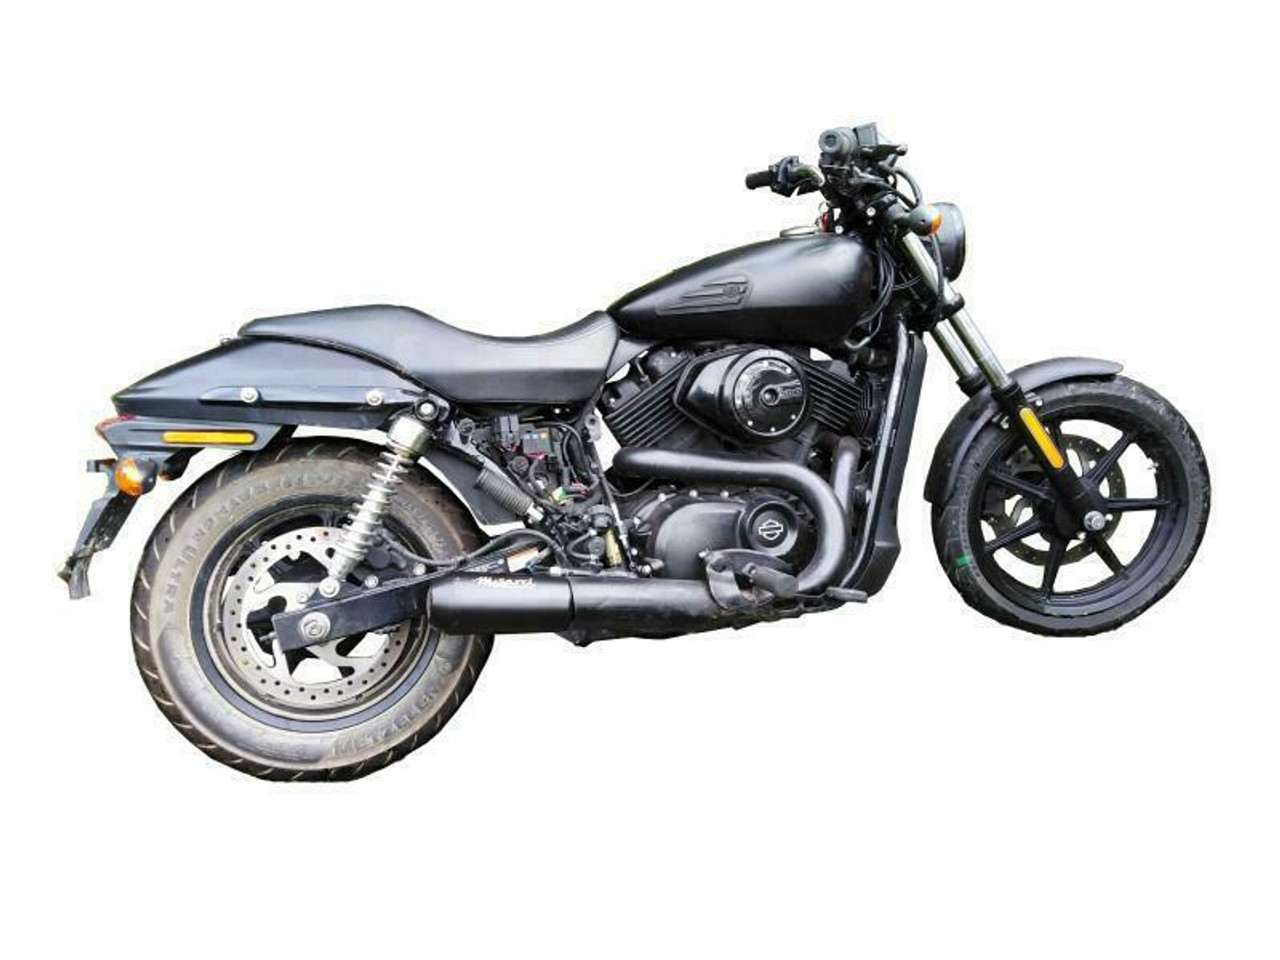 Harley Davidson Street 750 XG750 - Musarri Street Series GP Slip-on Exhaust